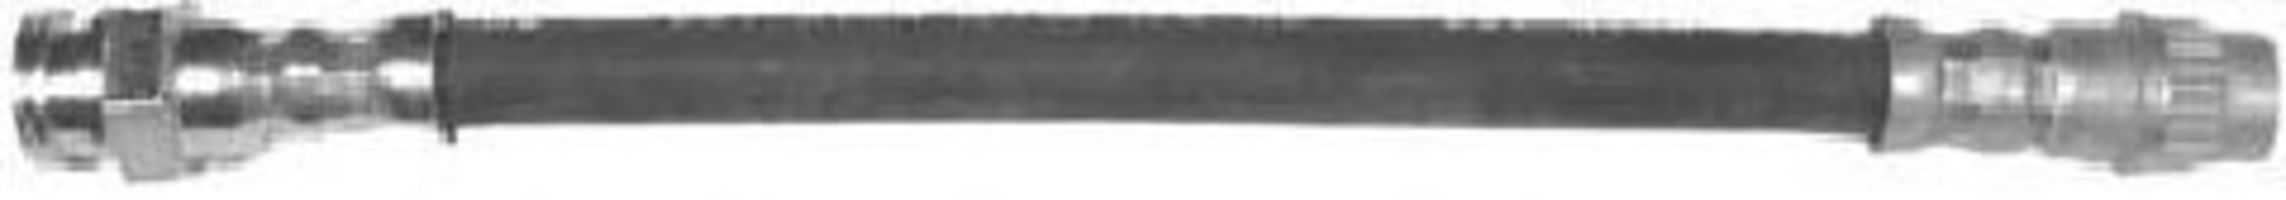 Шланг тормозной METALCAUCHO 96163